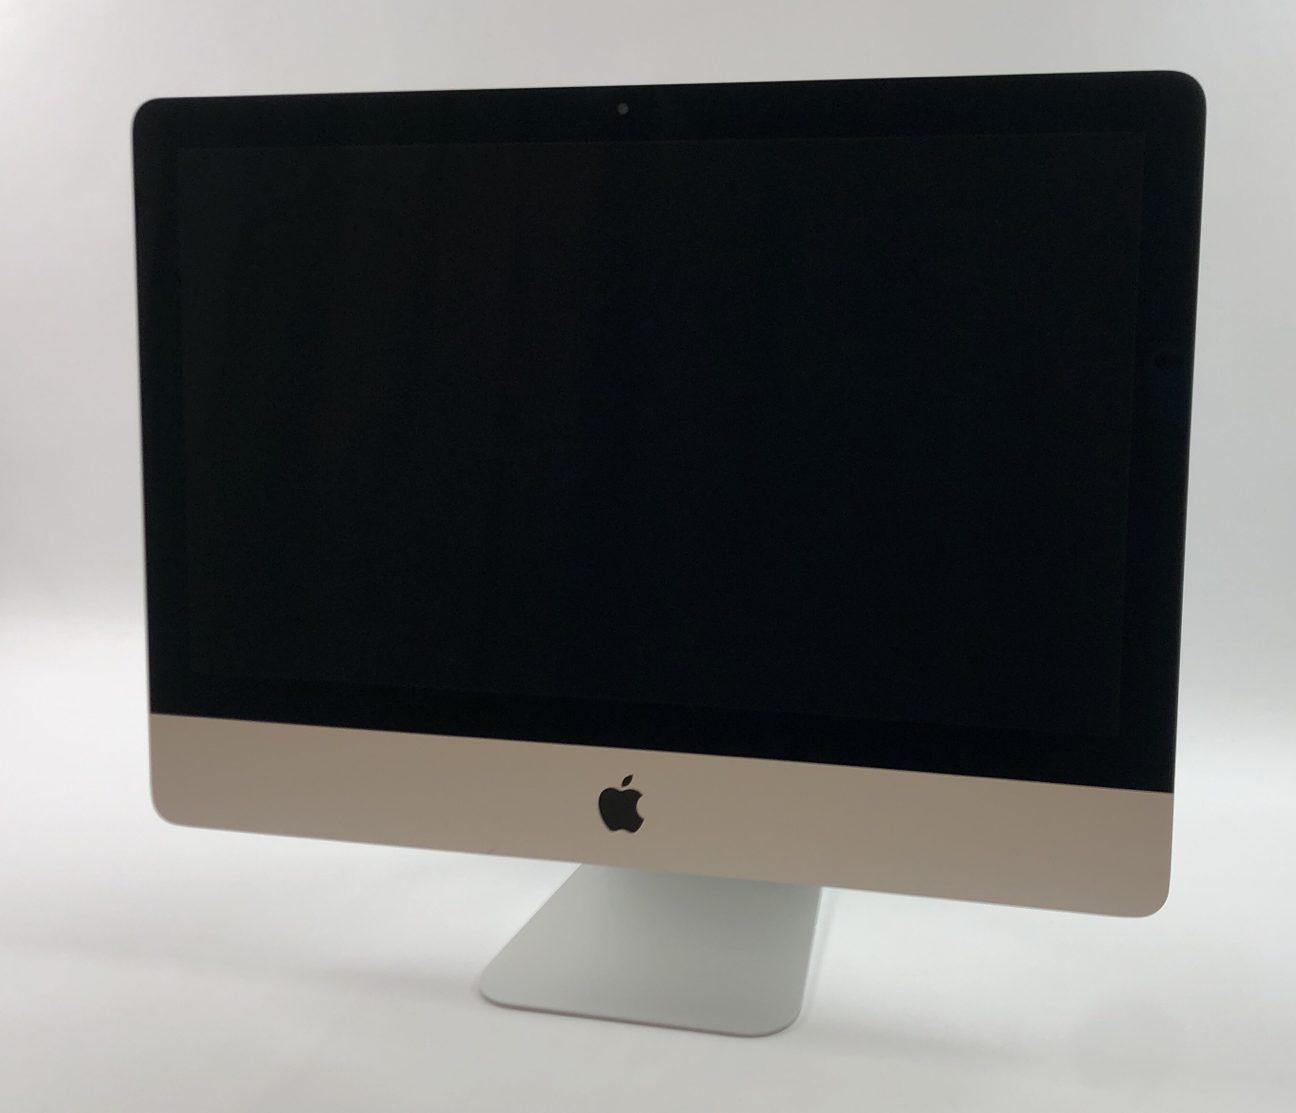 "iMac 21.5"" Mid 2017 (Intel Core i5 2.3 GHz 8 GB RAM 1 TB HDD), Intel Core i5 2.3 GHz, 8 GB RAM, 1 TB HDD, imagen 1"